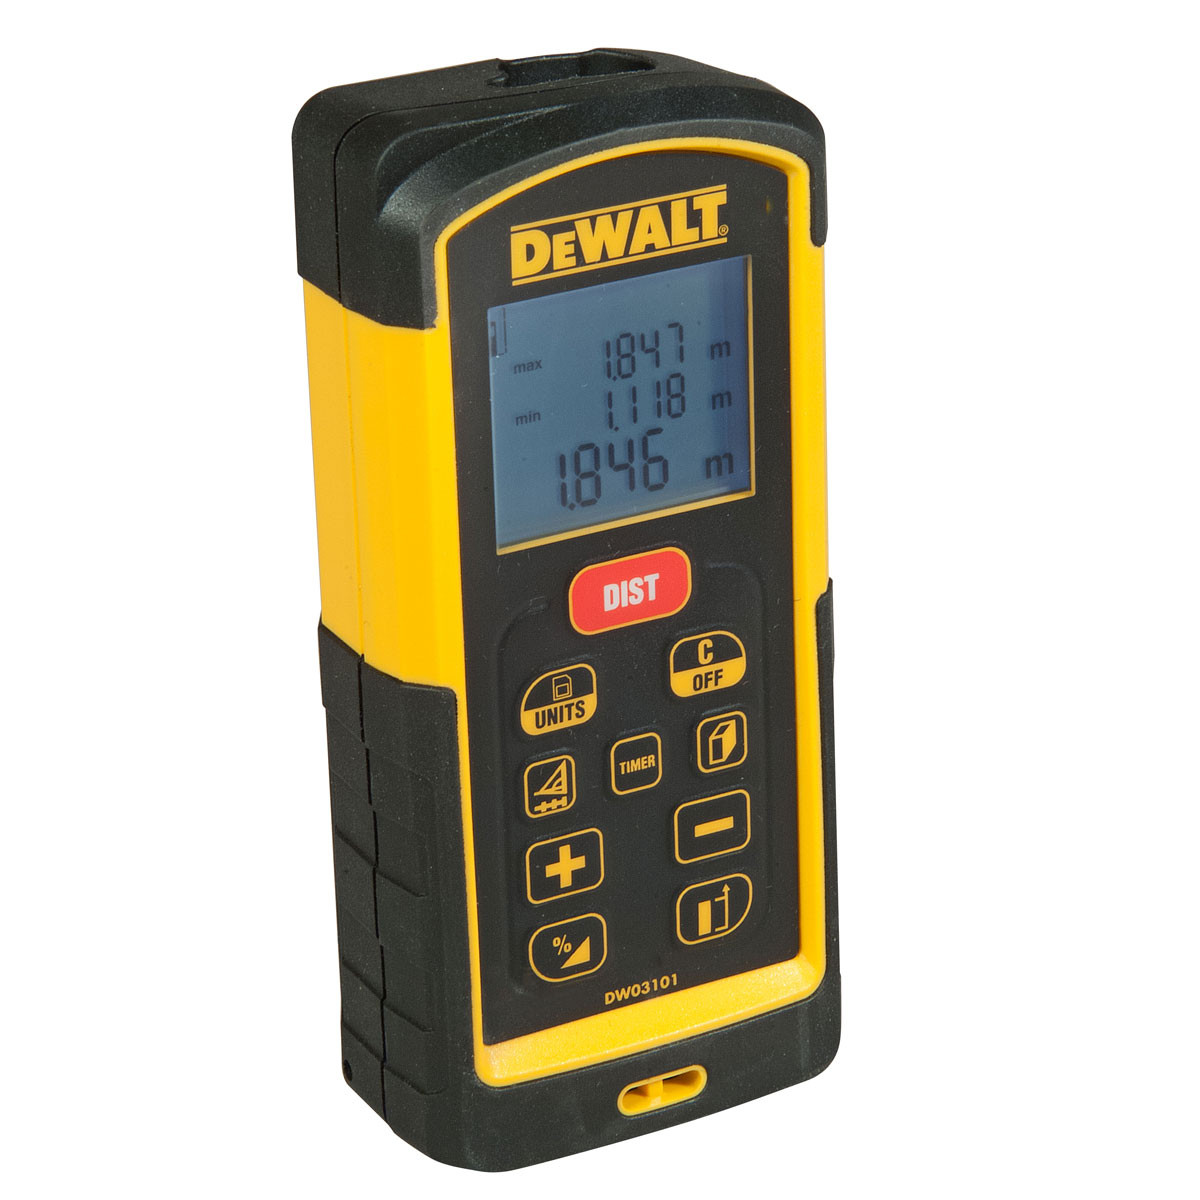 Misuratore laser metro distanziometro 100 m Dewalt DW03101